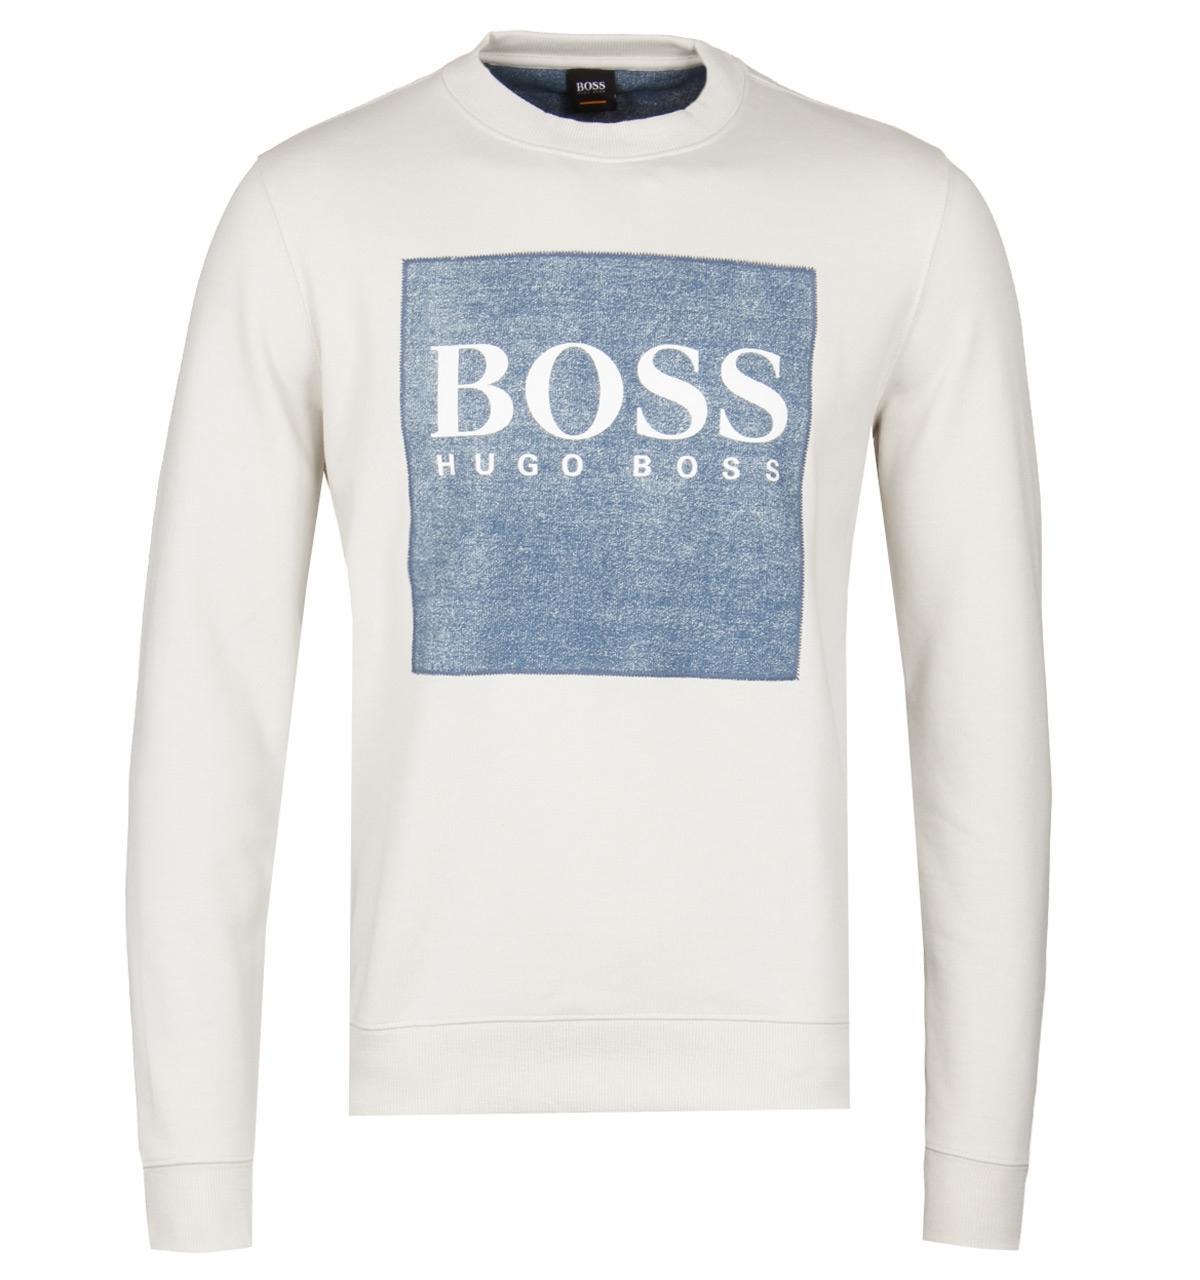 cc3531ca0 BOSS Orange Boss Wedford Beige Crew Sweatshirt in Natural for Men - Lyst